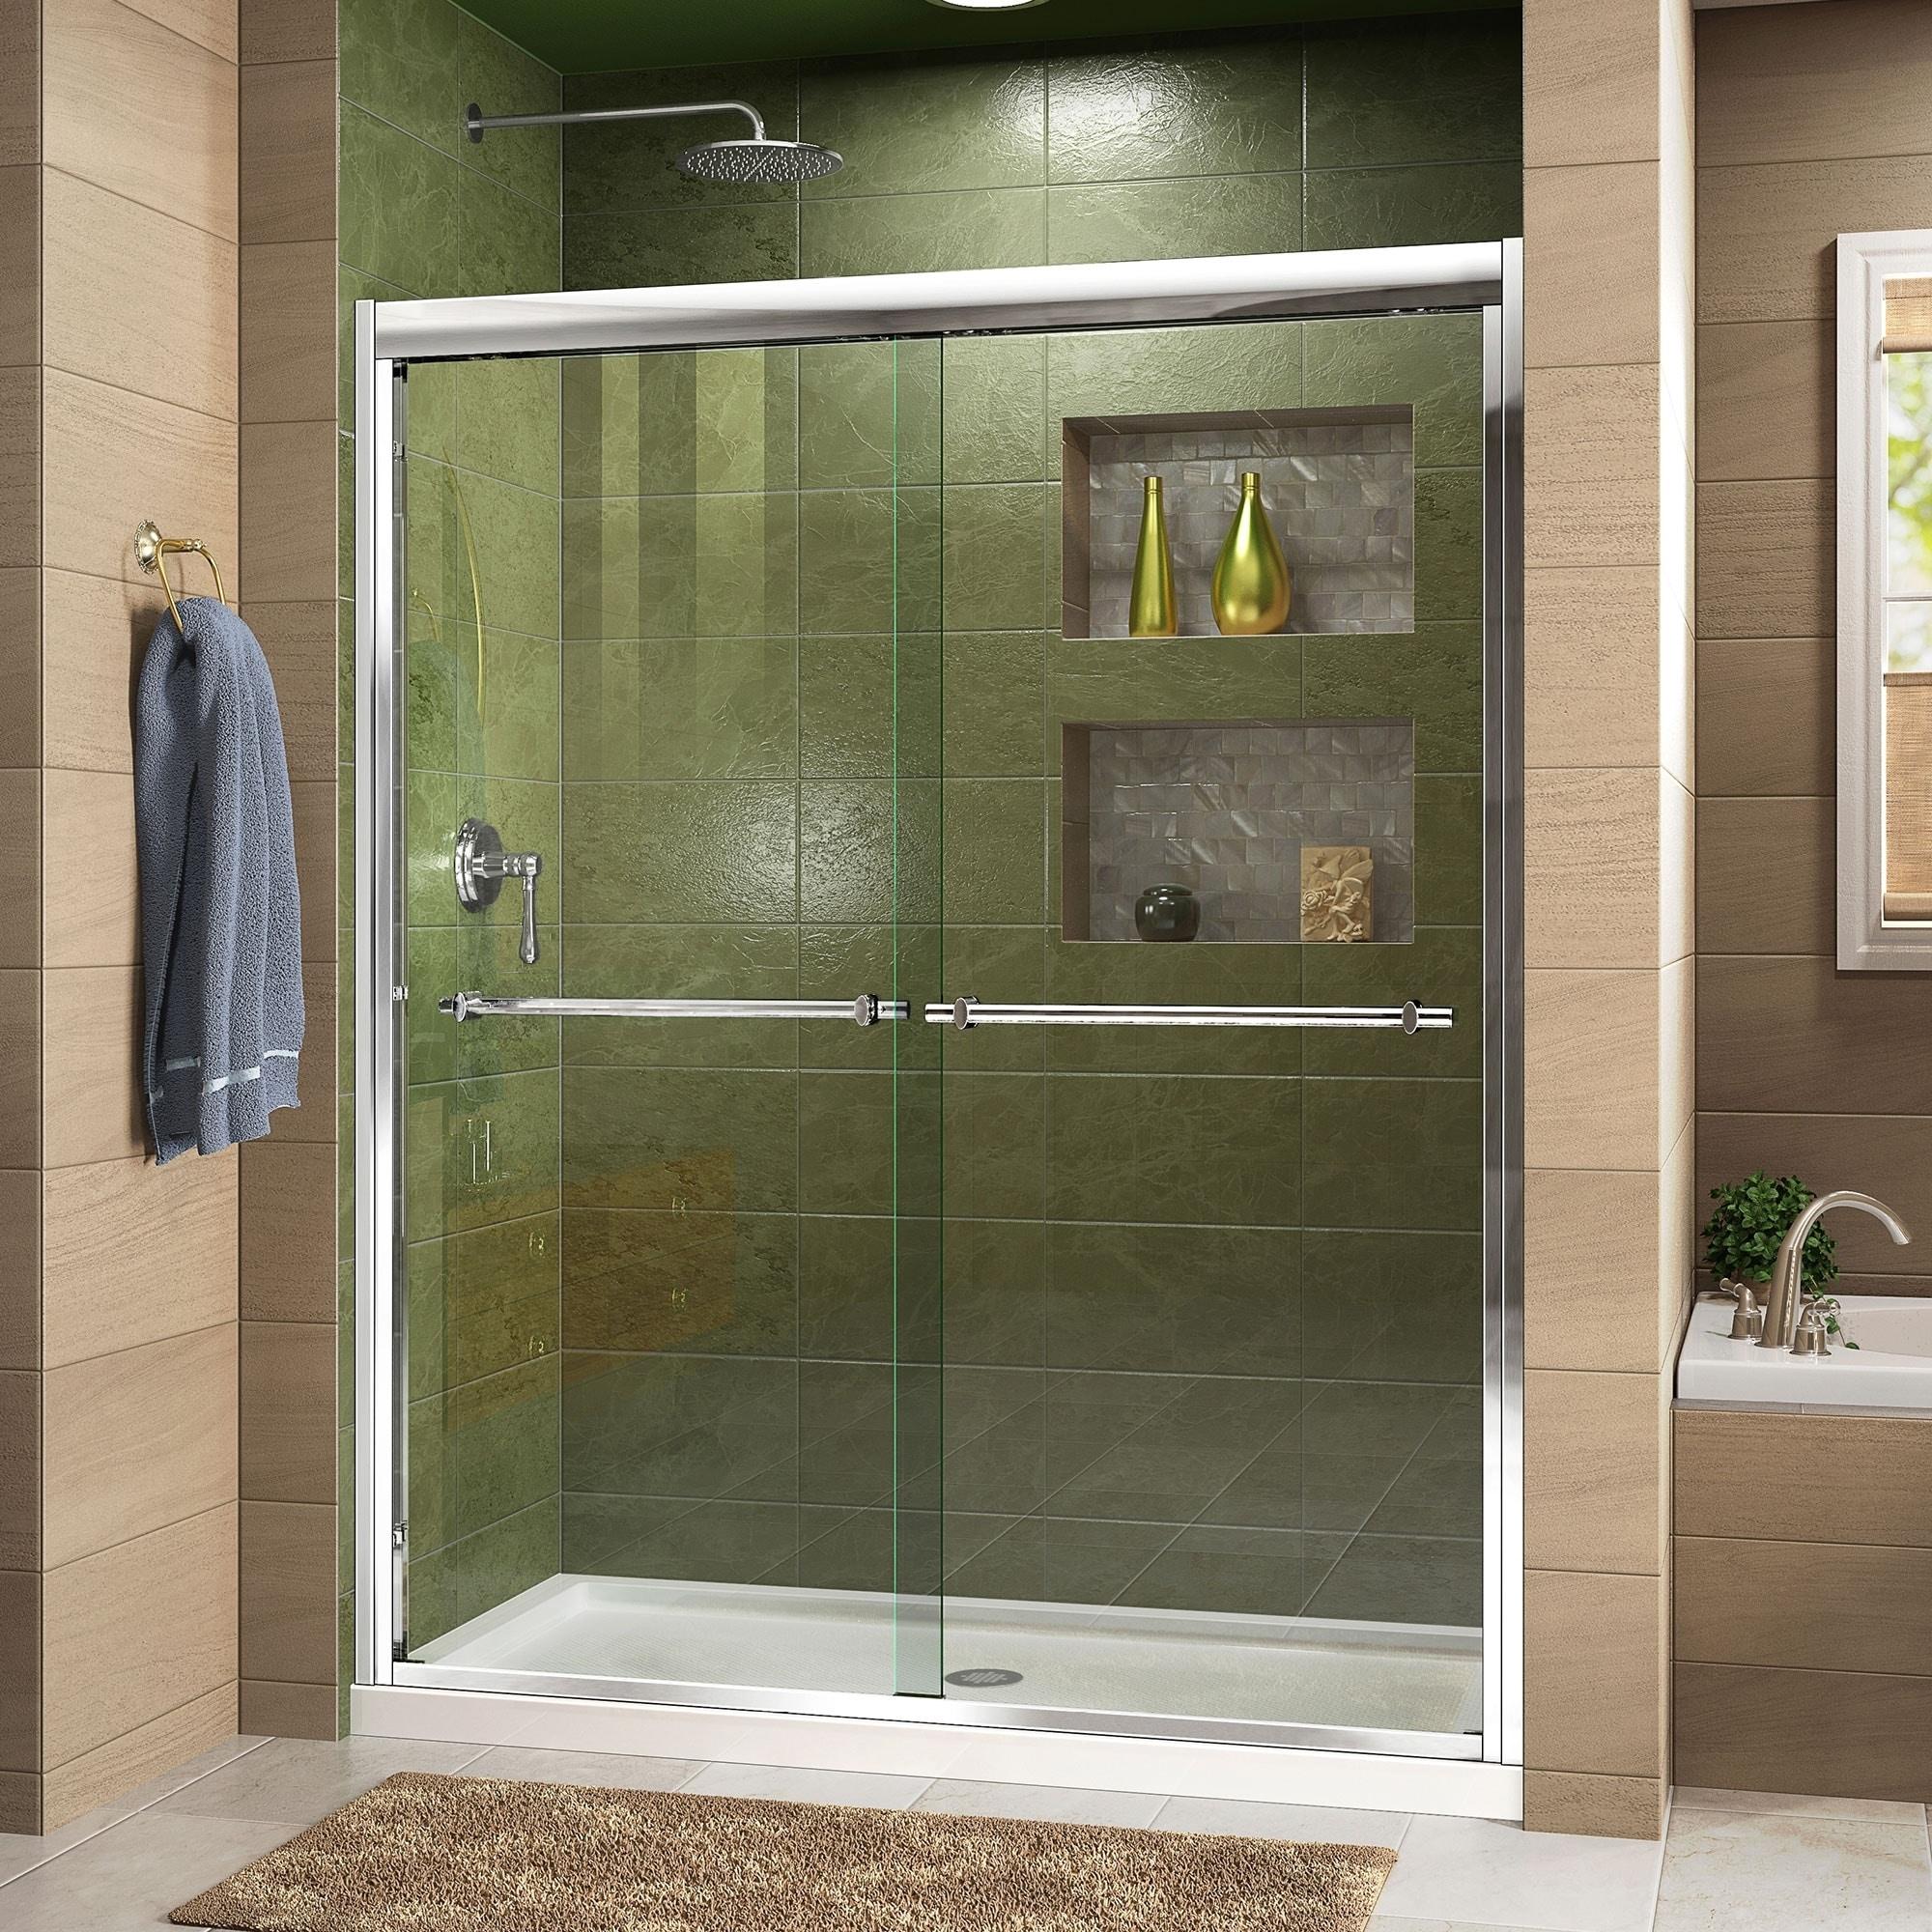 Dreamline Duet 56 60 In W X 72 In H Semi Frameless Bypass Sliding Shower Door 56 60 W